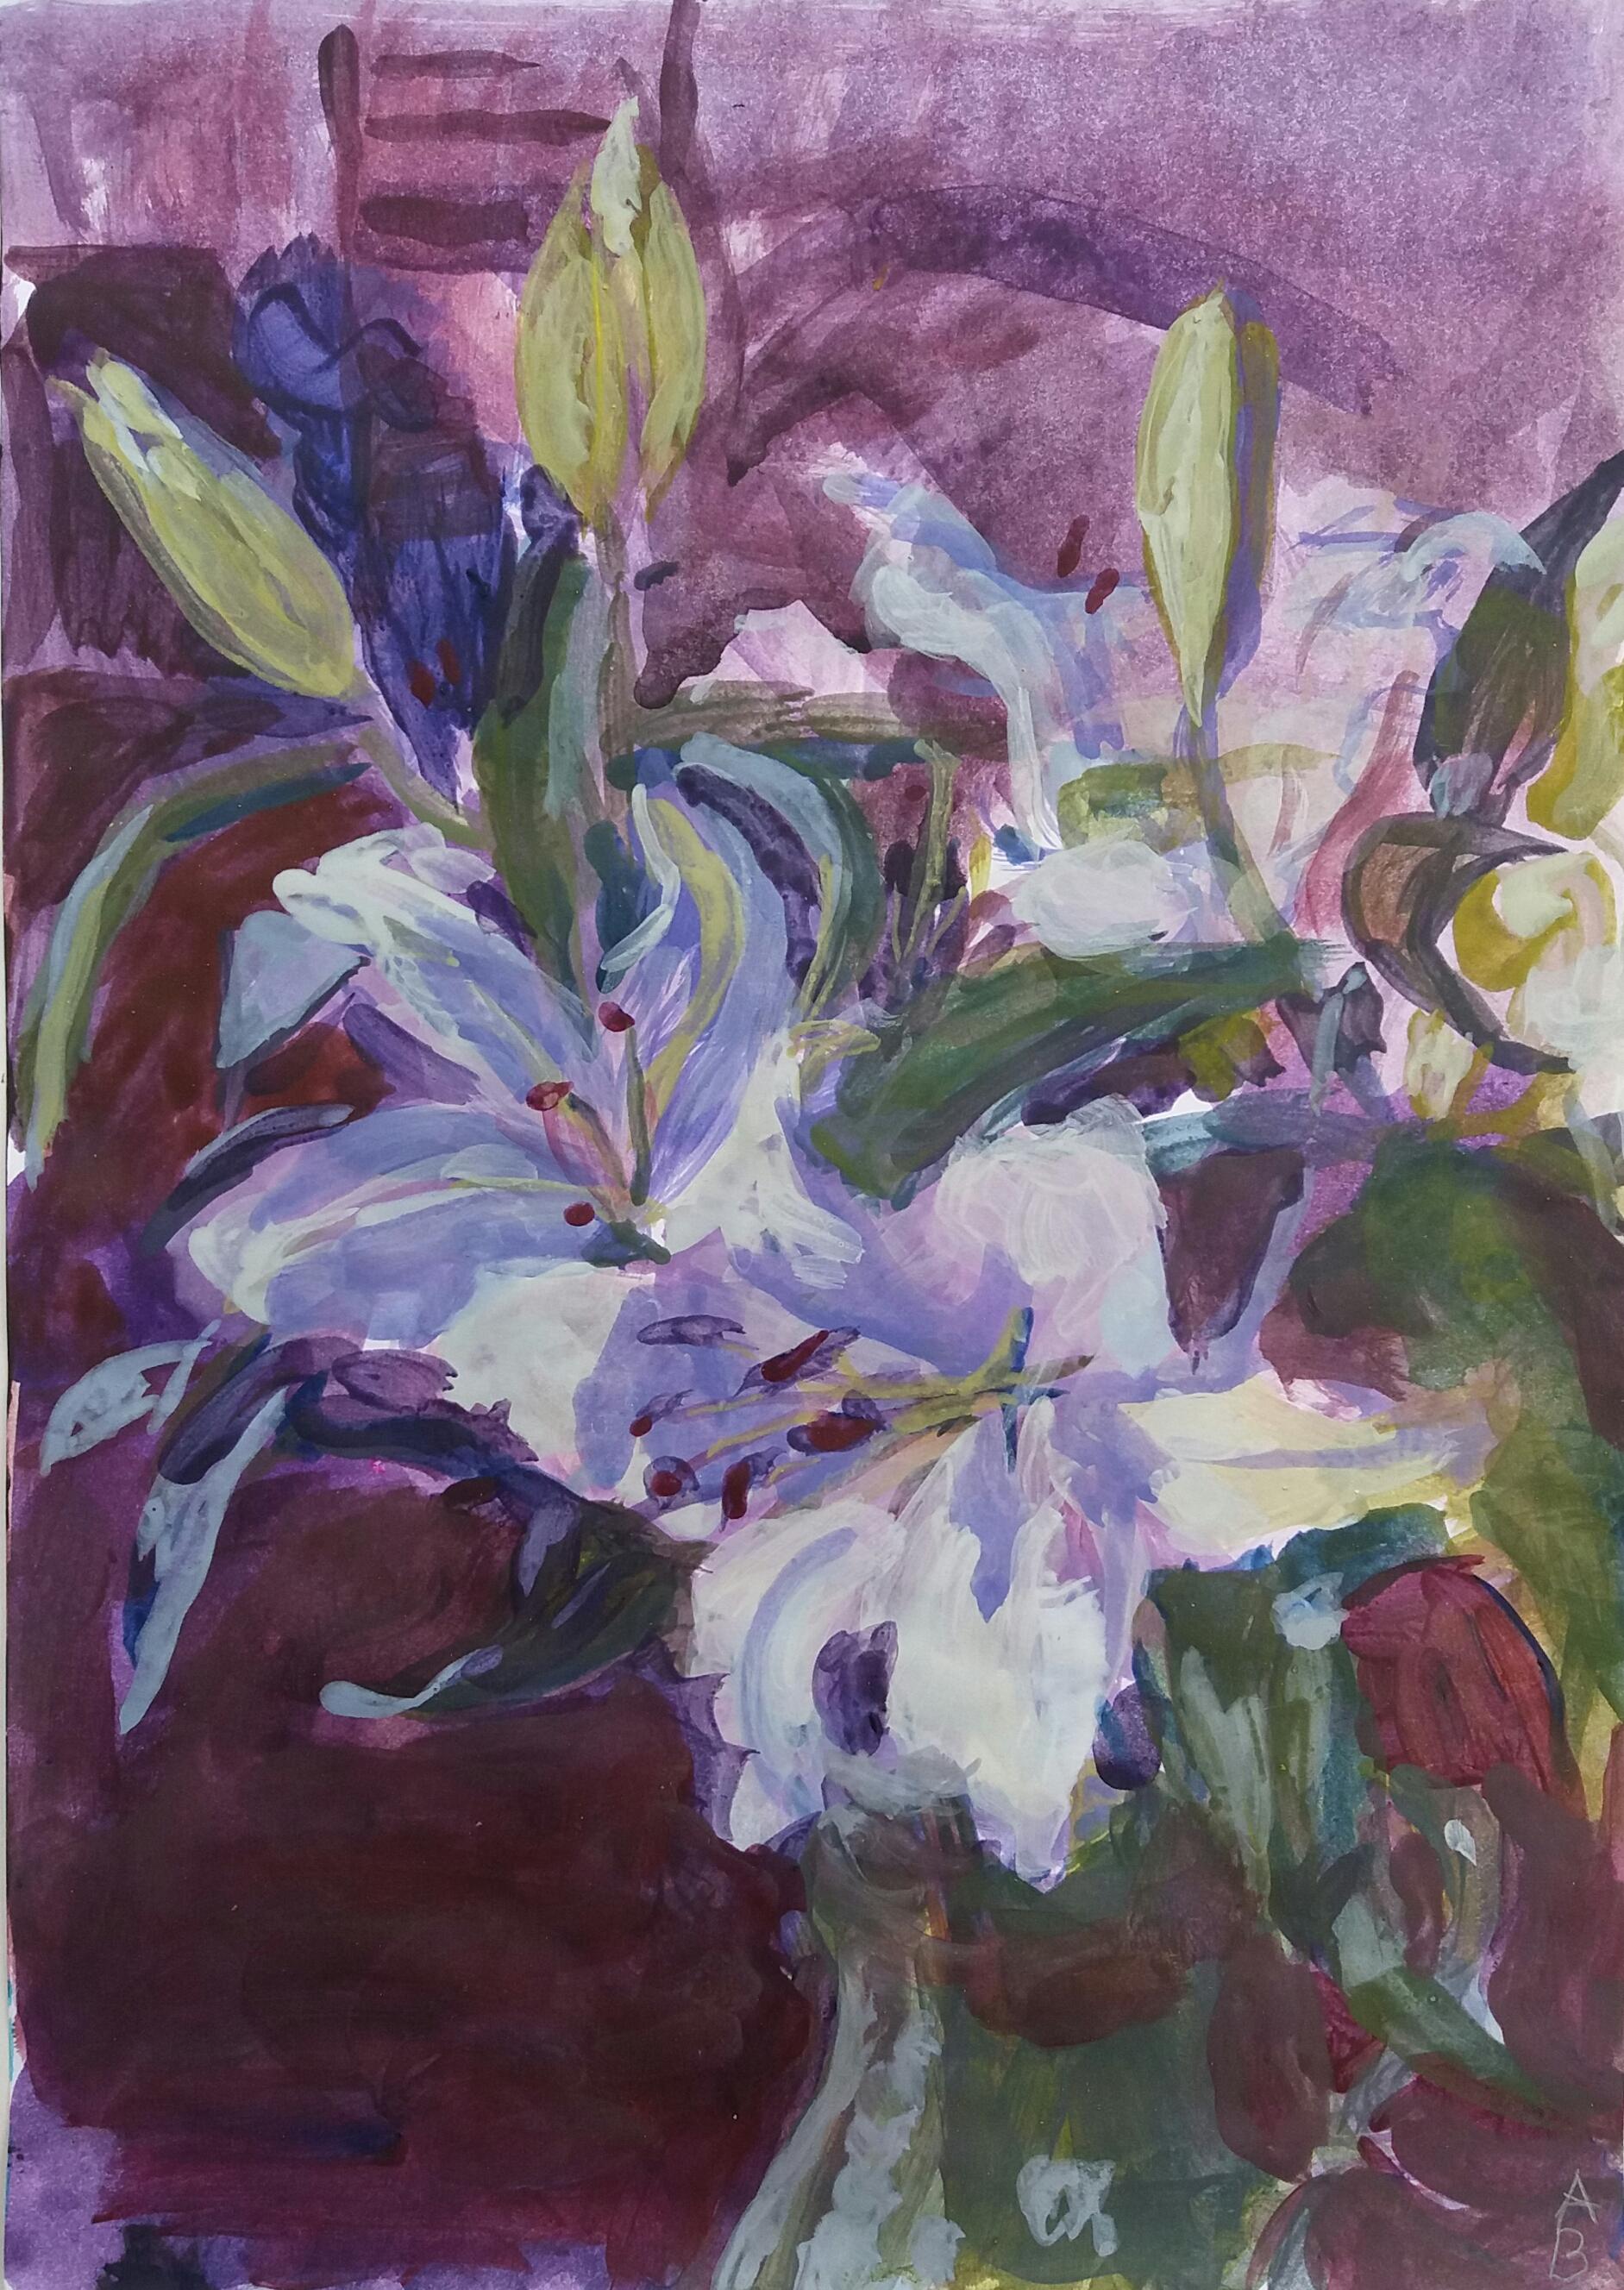 vita liljor i vas